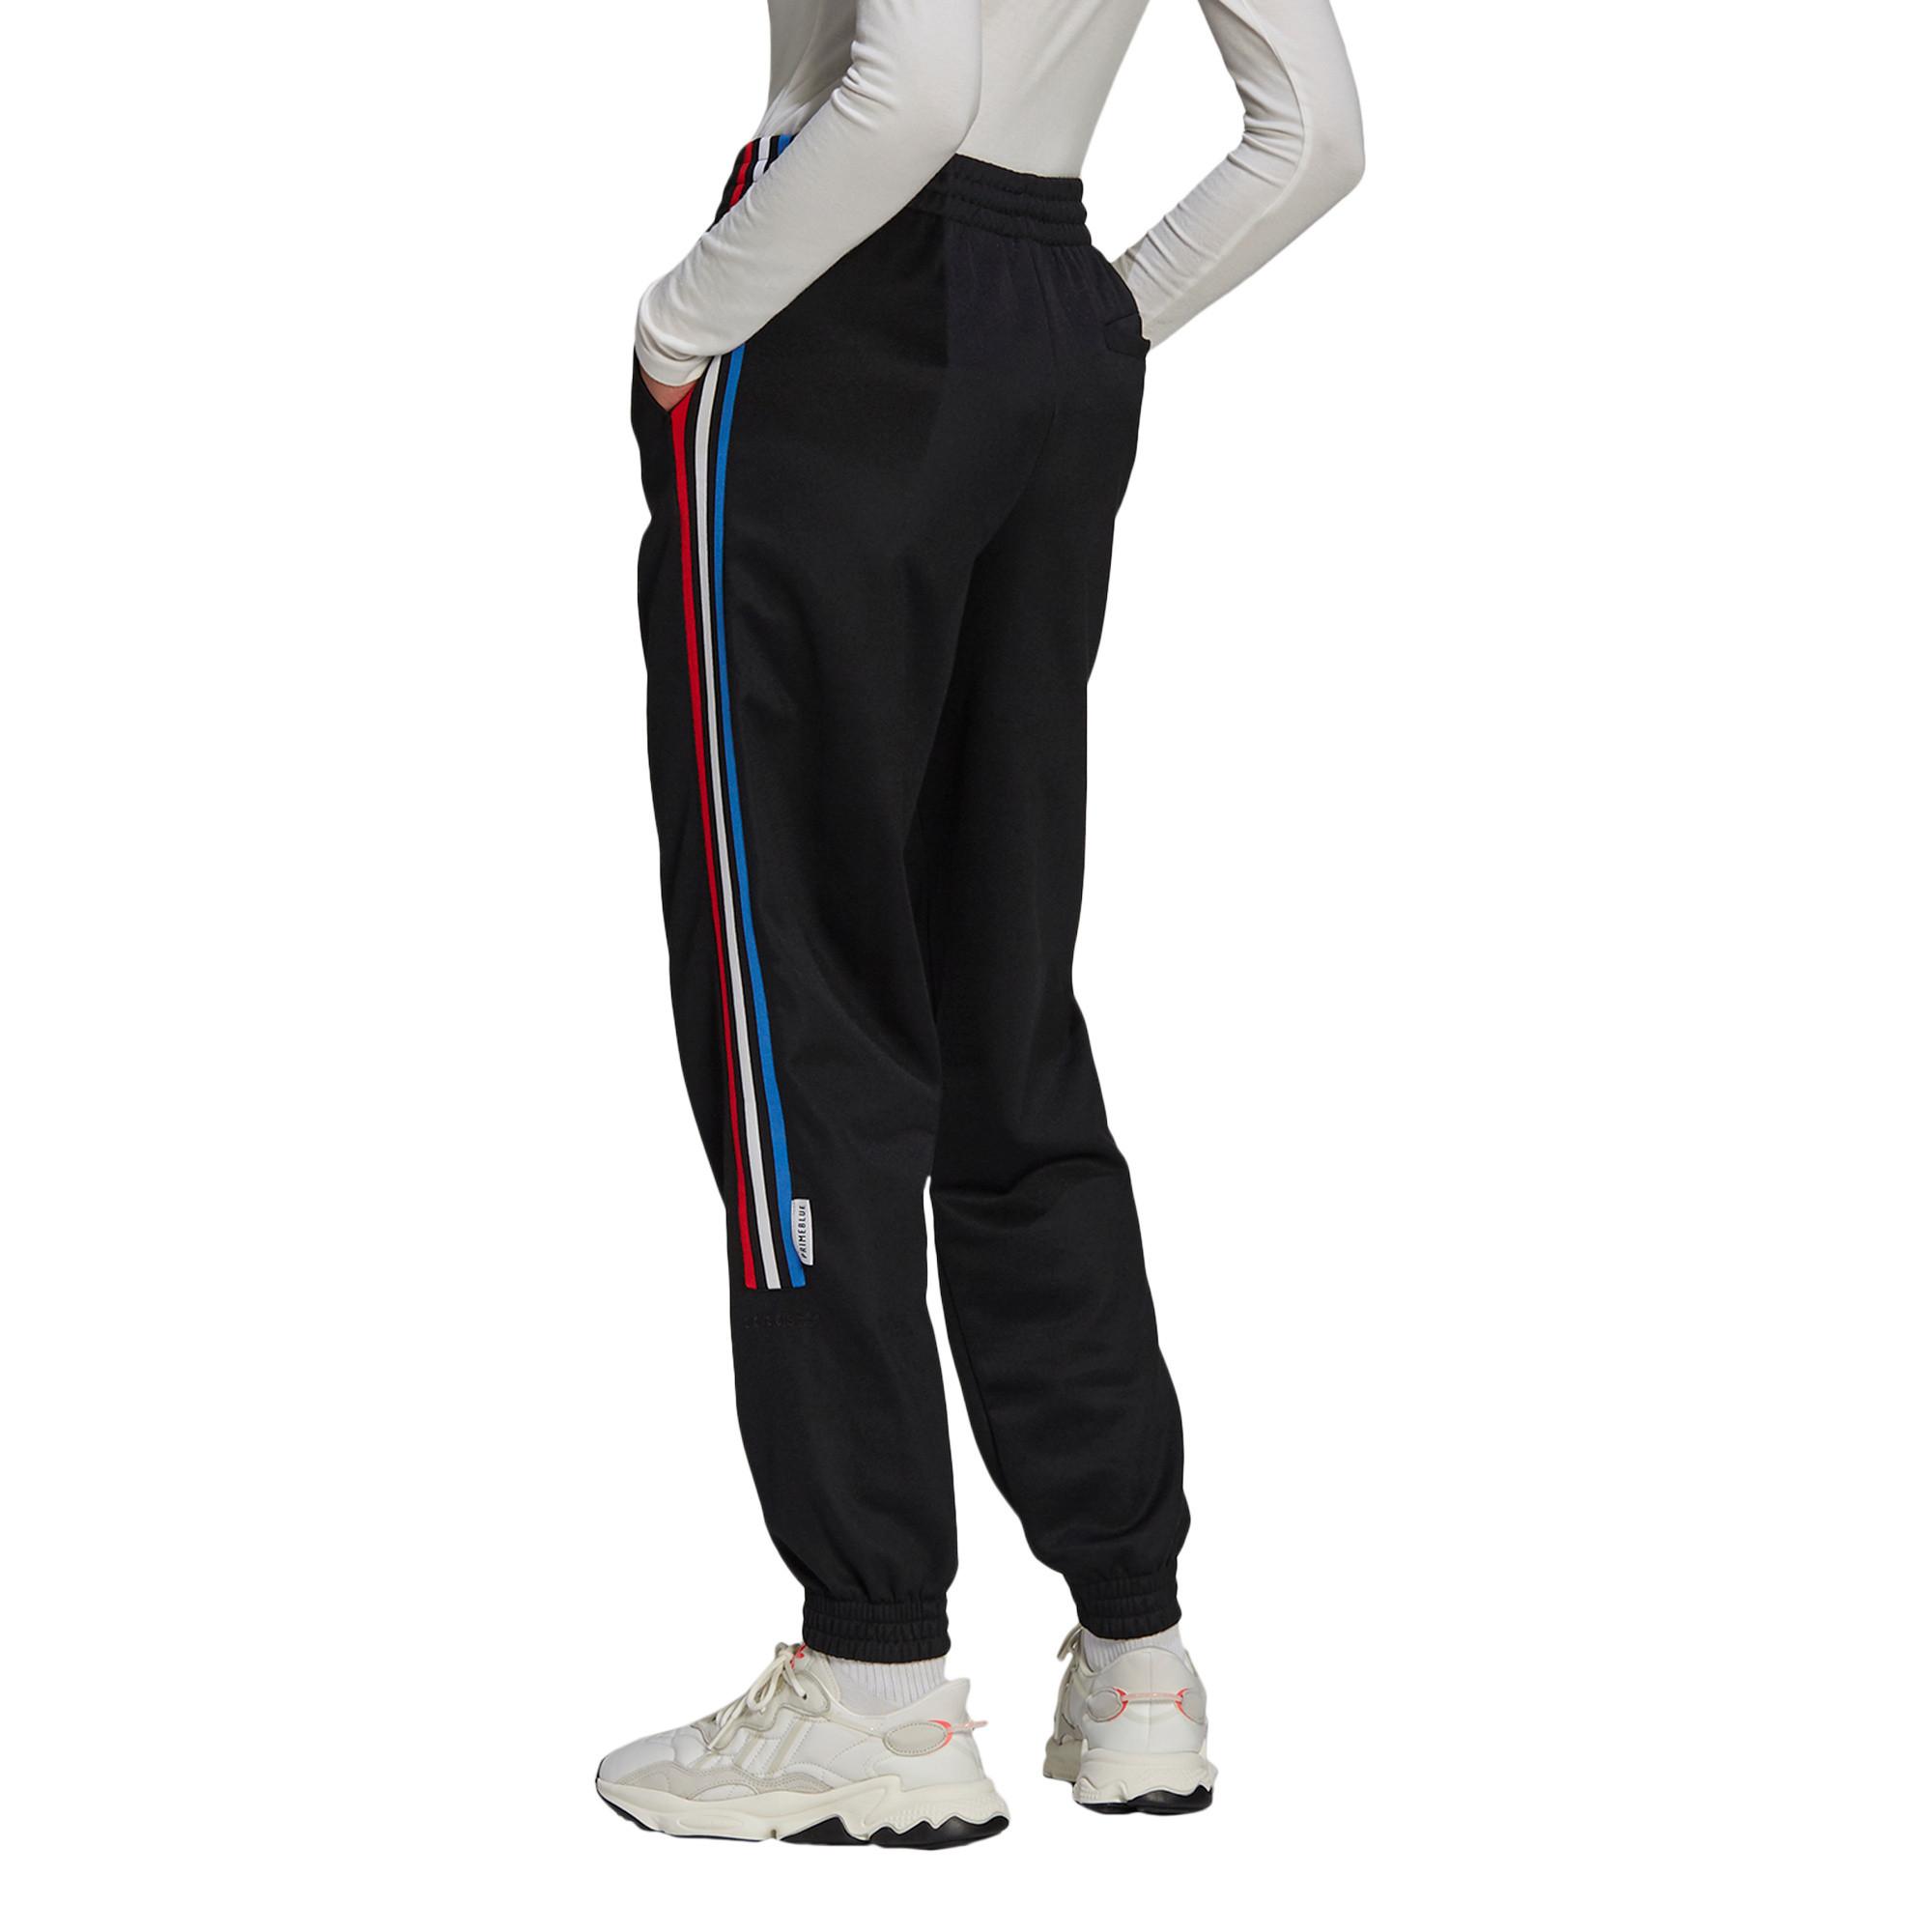 Pantaloni tuta adicolor Tricolor Primeblue, Nero, large image number 2